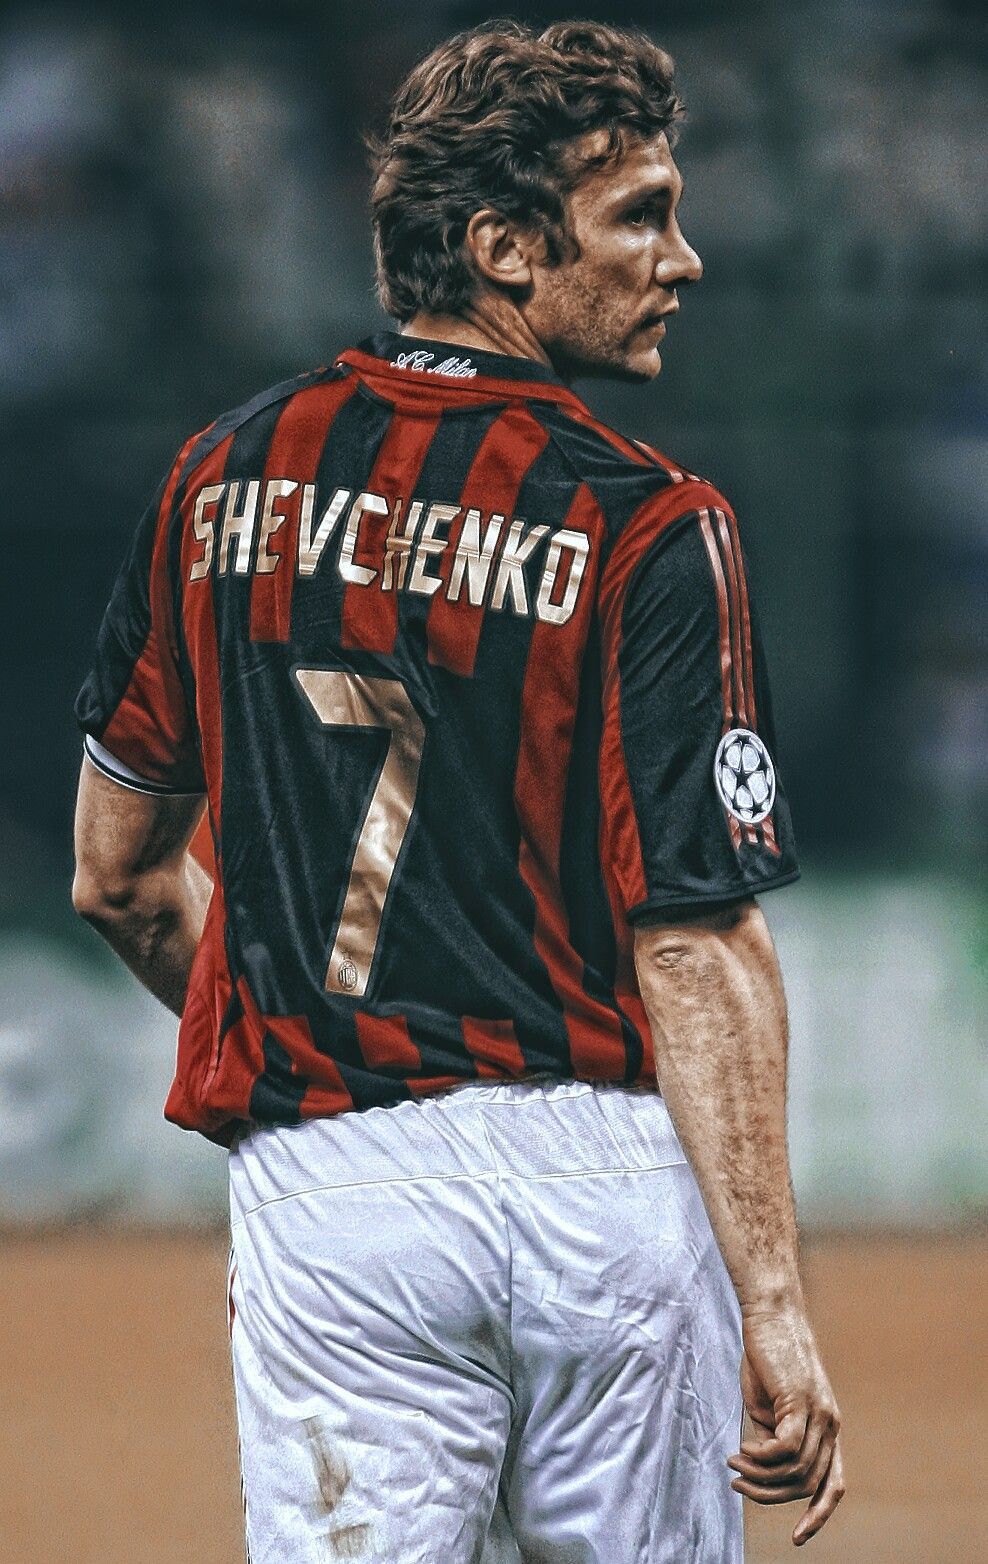 #legend Lendas do #football | #milan Shevchenko futebol